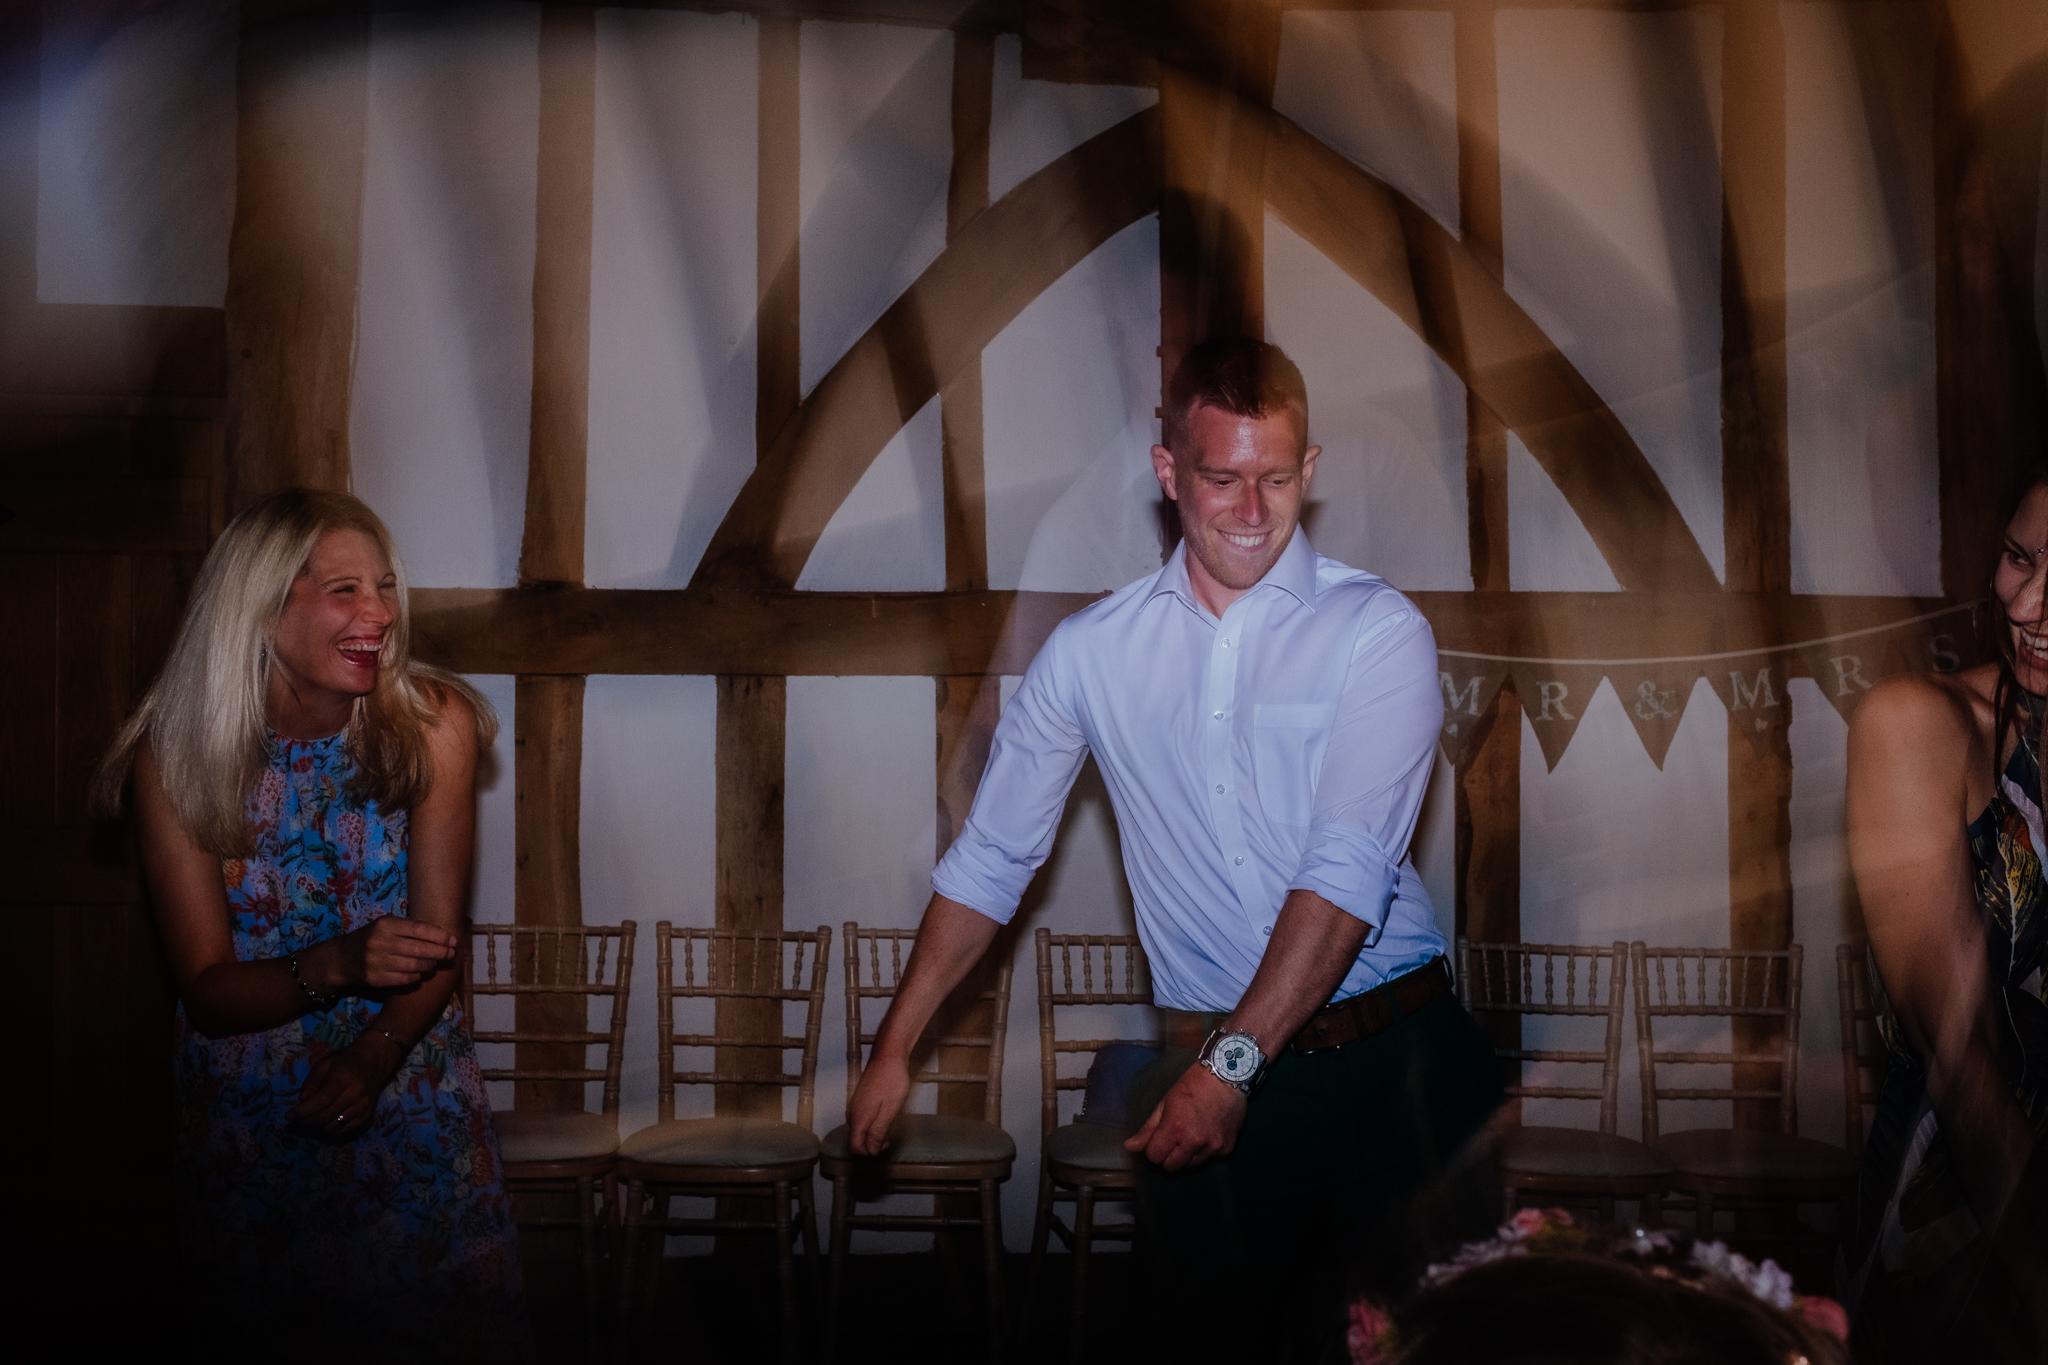 Wedding guests dancing at Rumbolds Farm